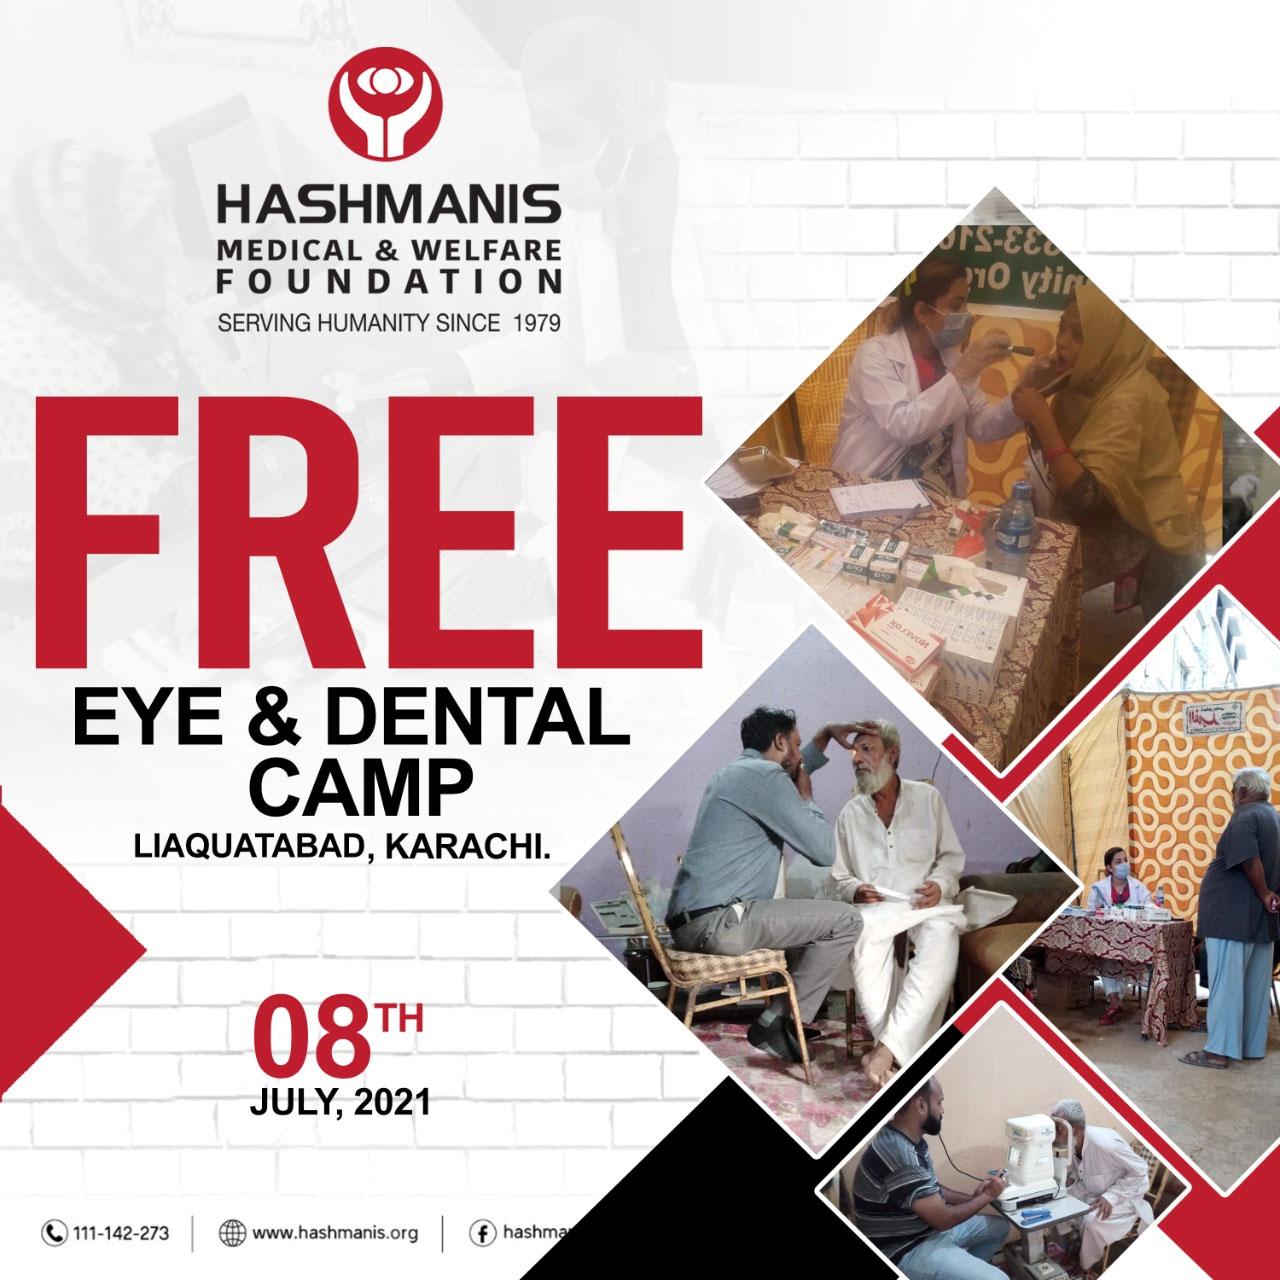 Free Eye & Dental Camp Liaquatabad, Karachi